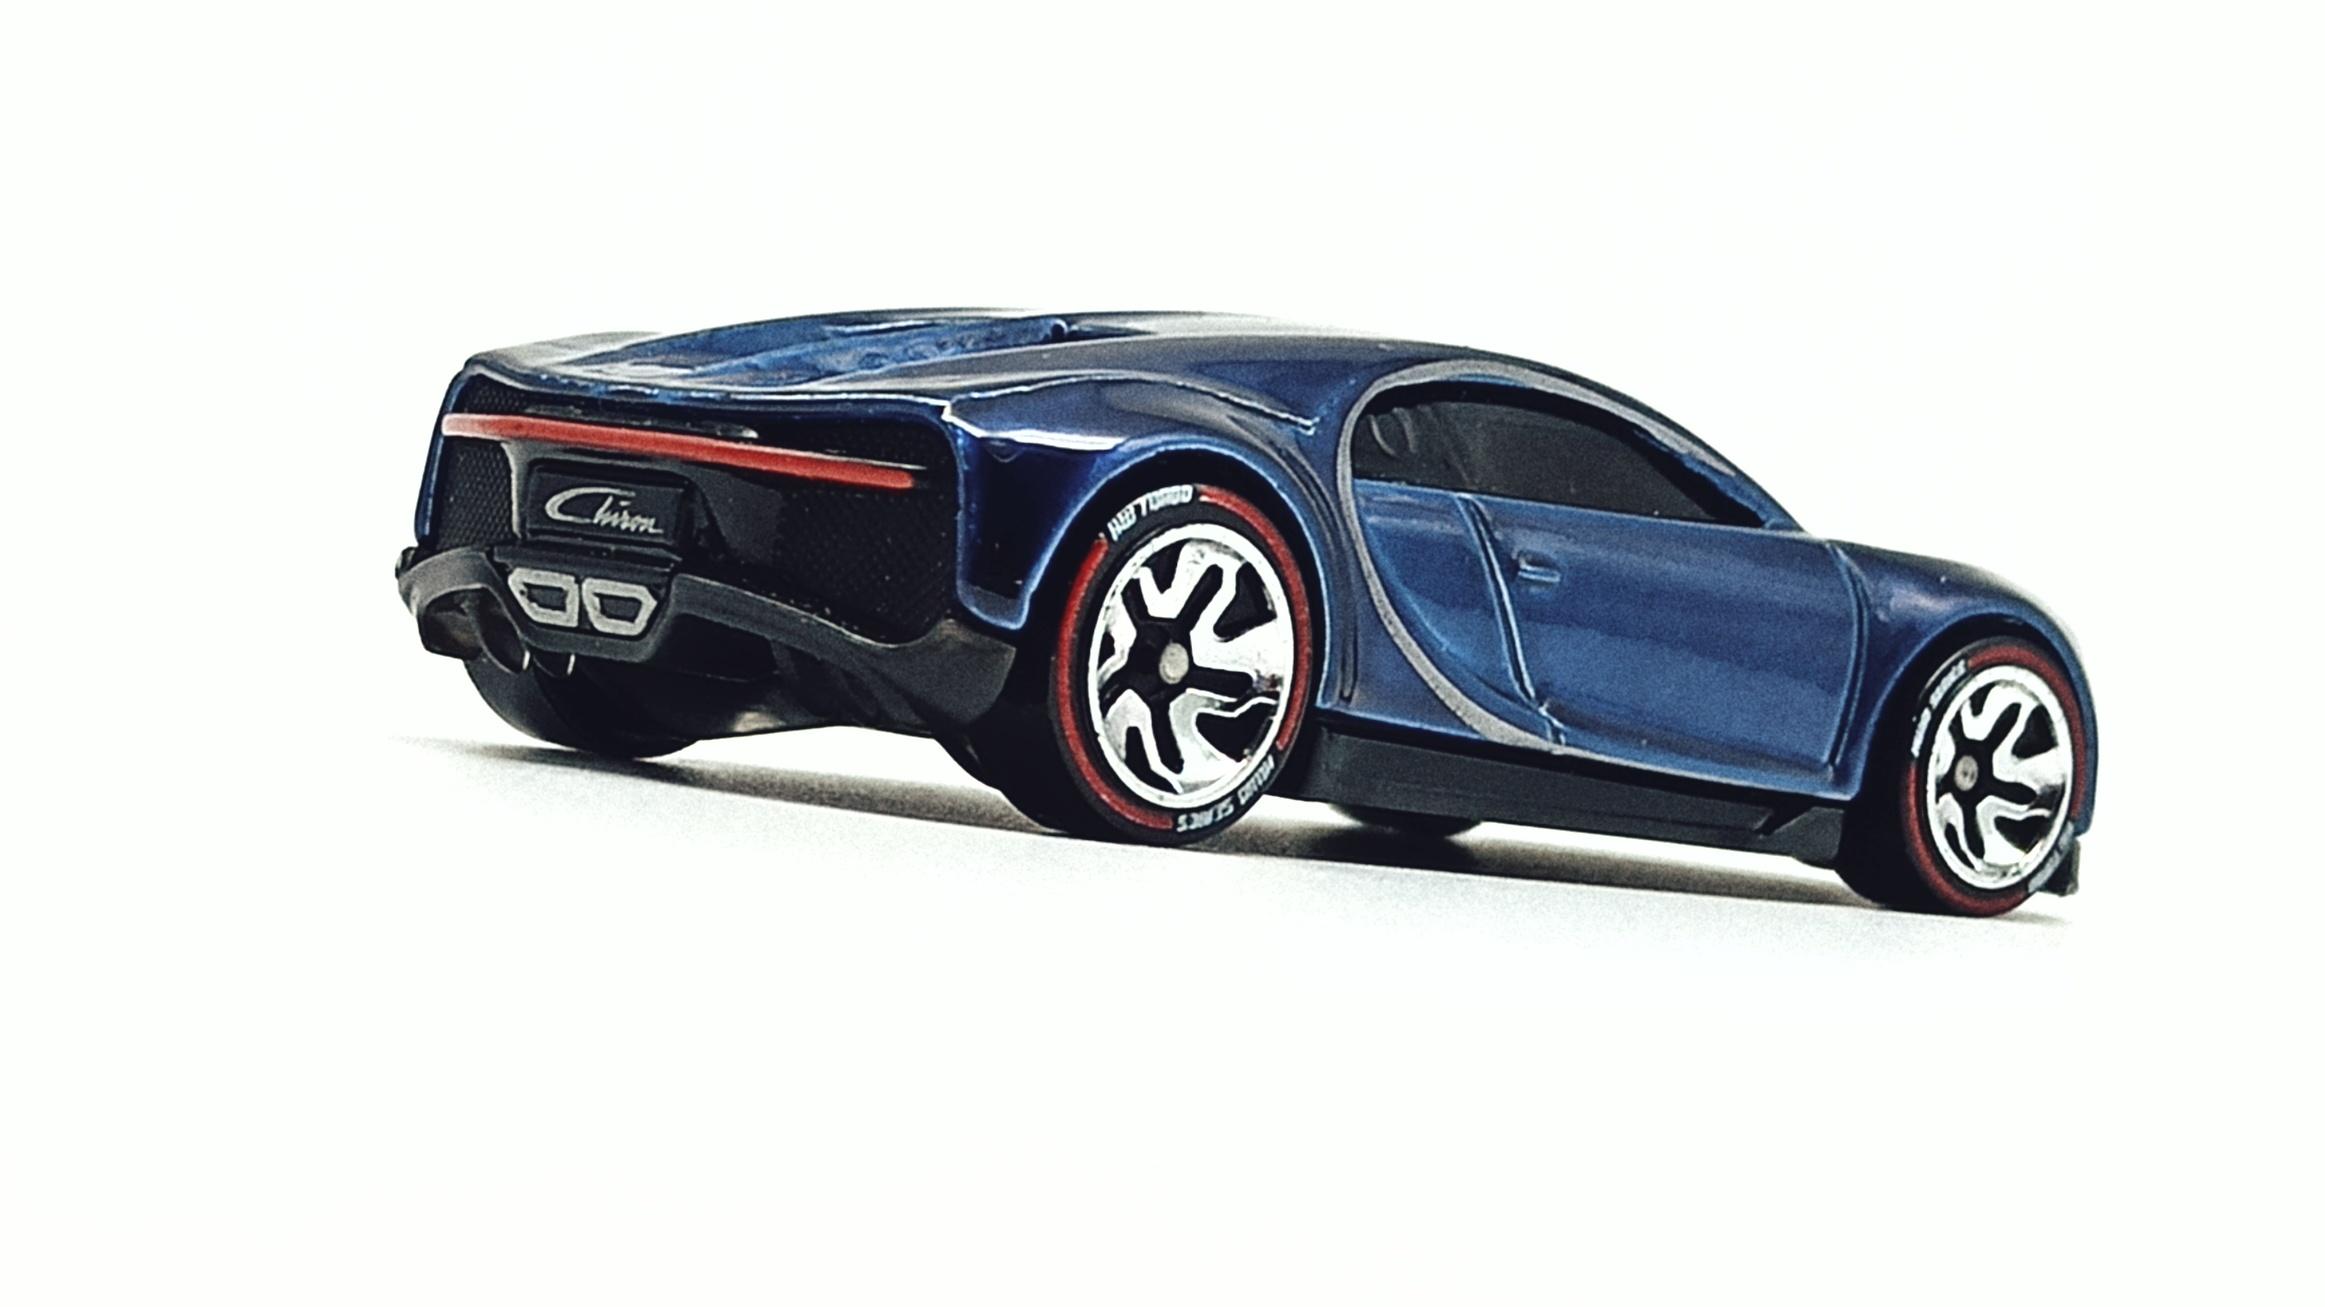 Hot Wheels id '16 Bugatti Chiron (HBG00) 2021 HW Turbo (3/4) spectraflame blue side angle